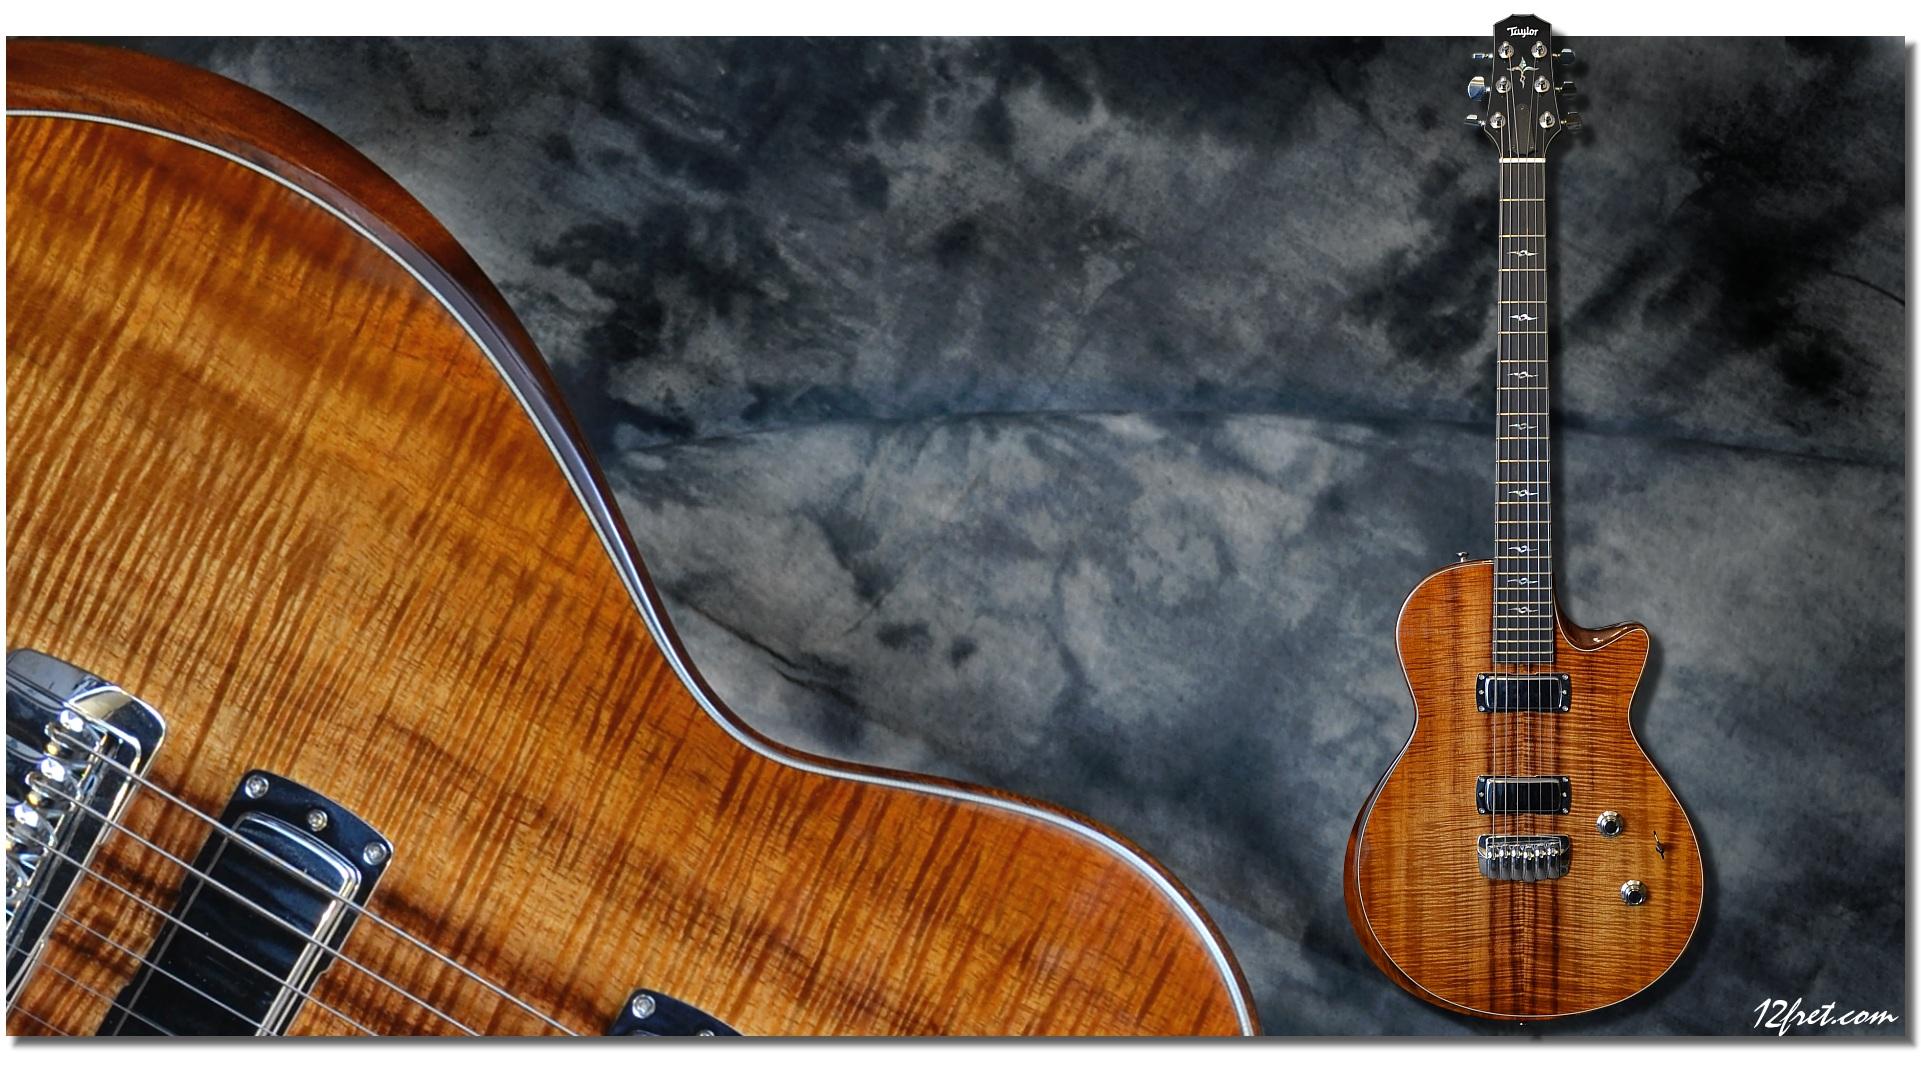 taylor custom solidbody electric guitar. Black Bedroom Furniture Sets. Home Design Ideas